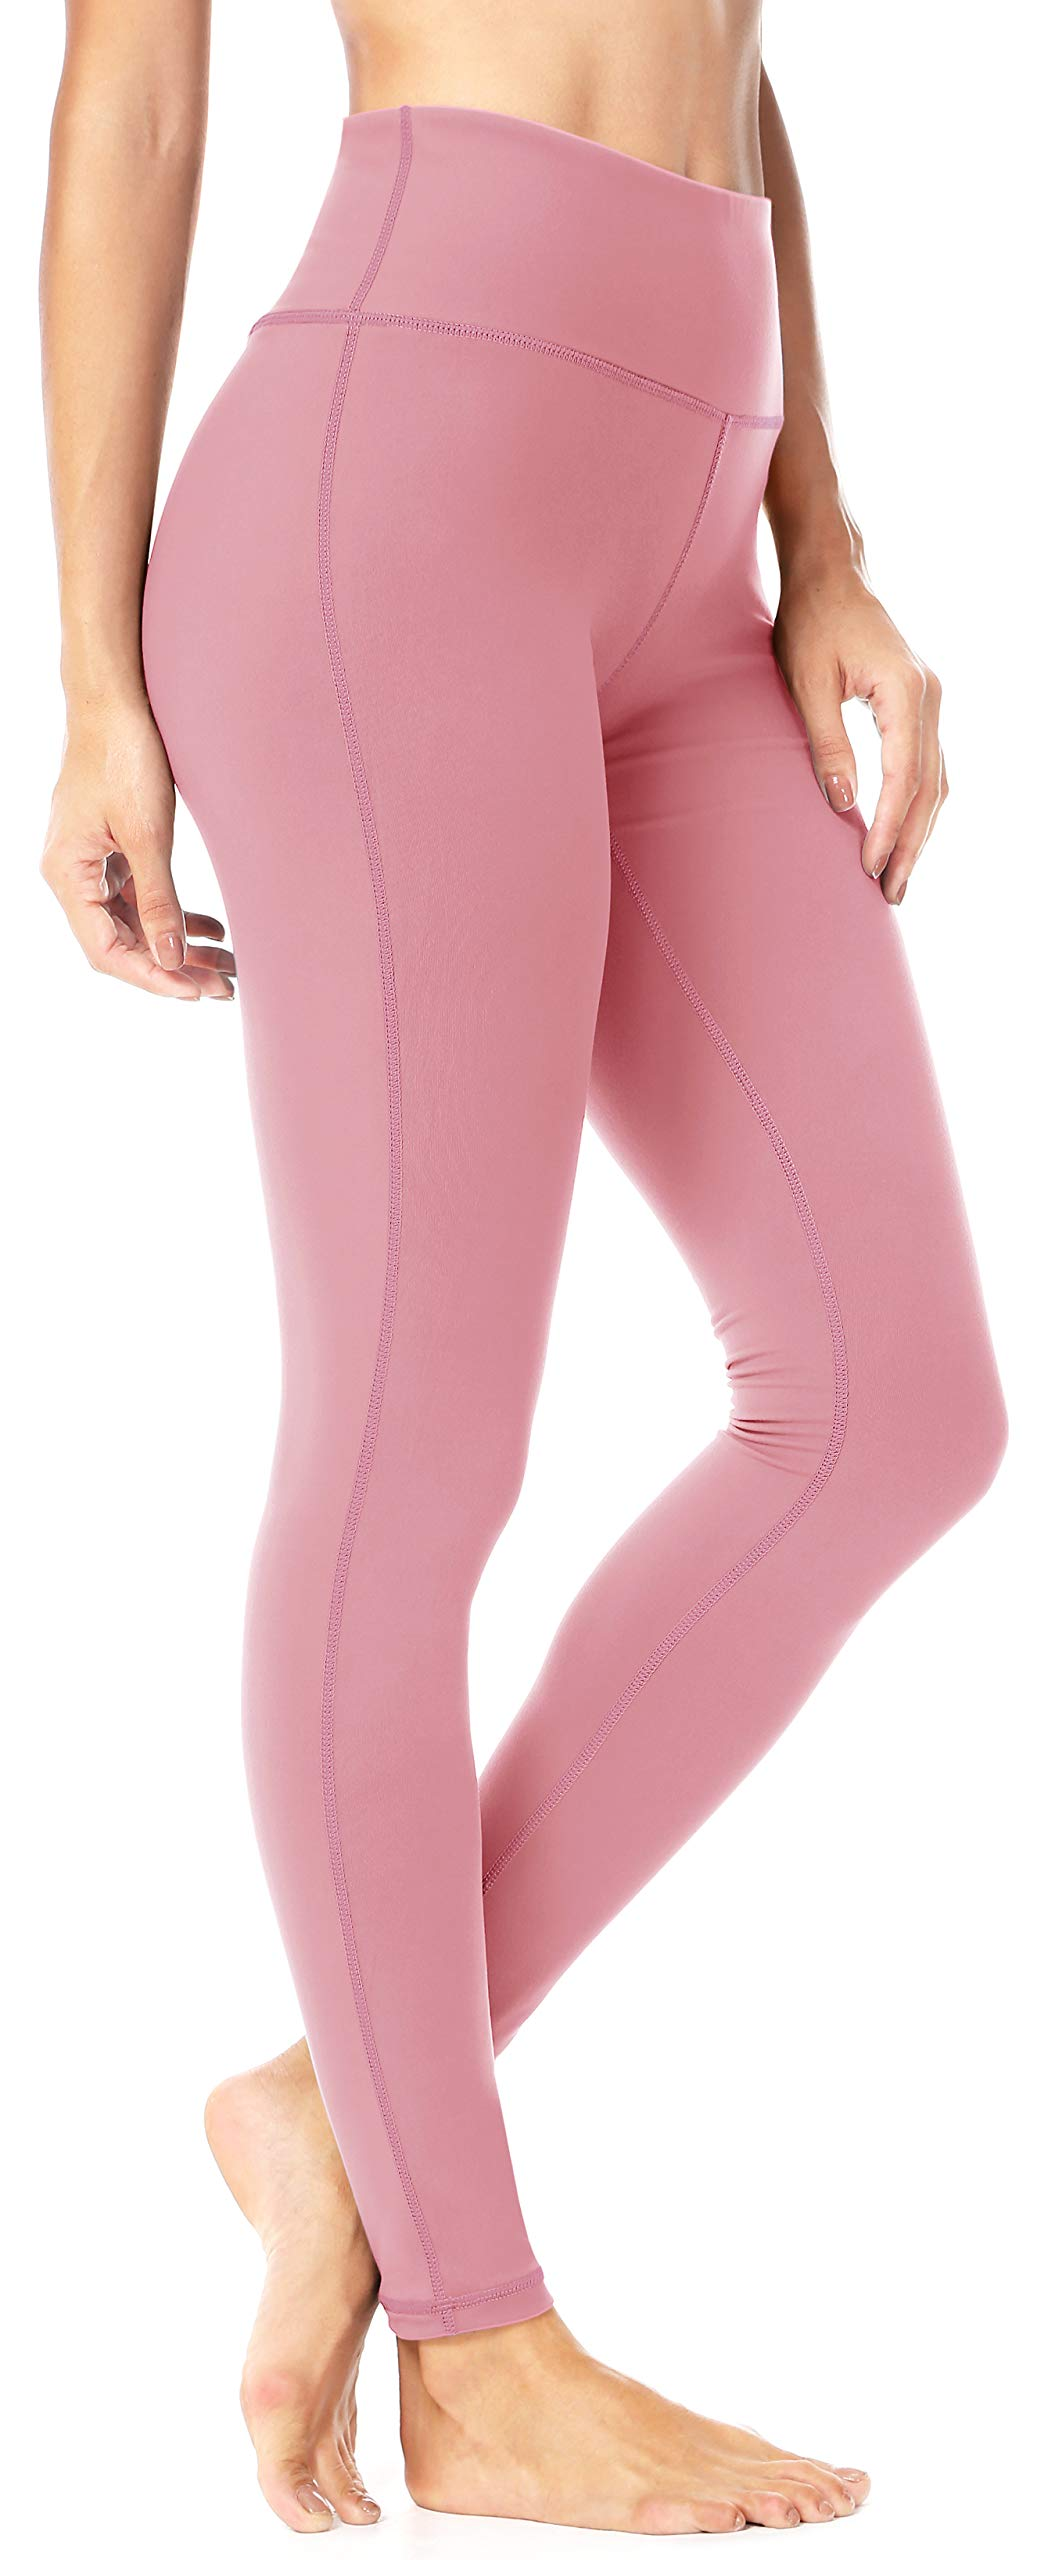 pink yoga leggings amazon comqueenie ke women power flex yoga pants workout running leggings